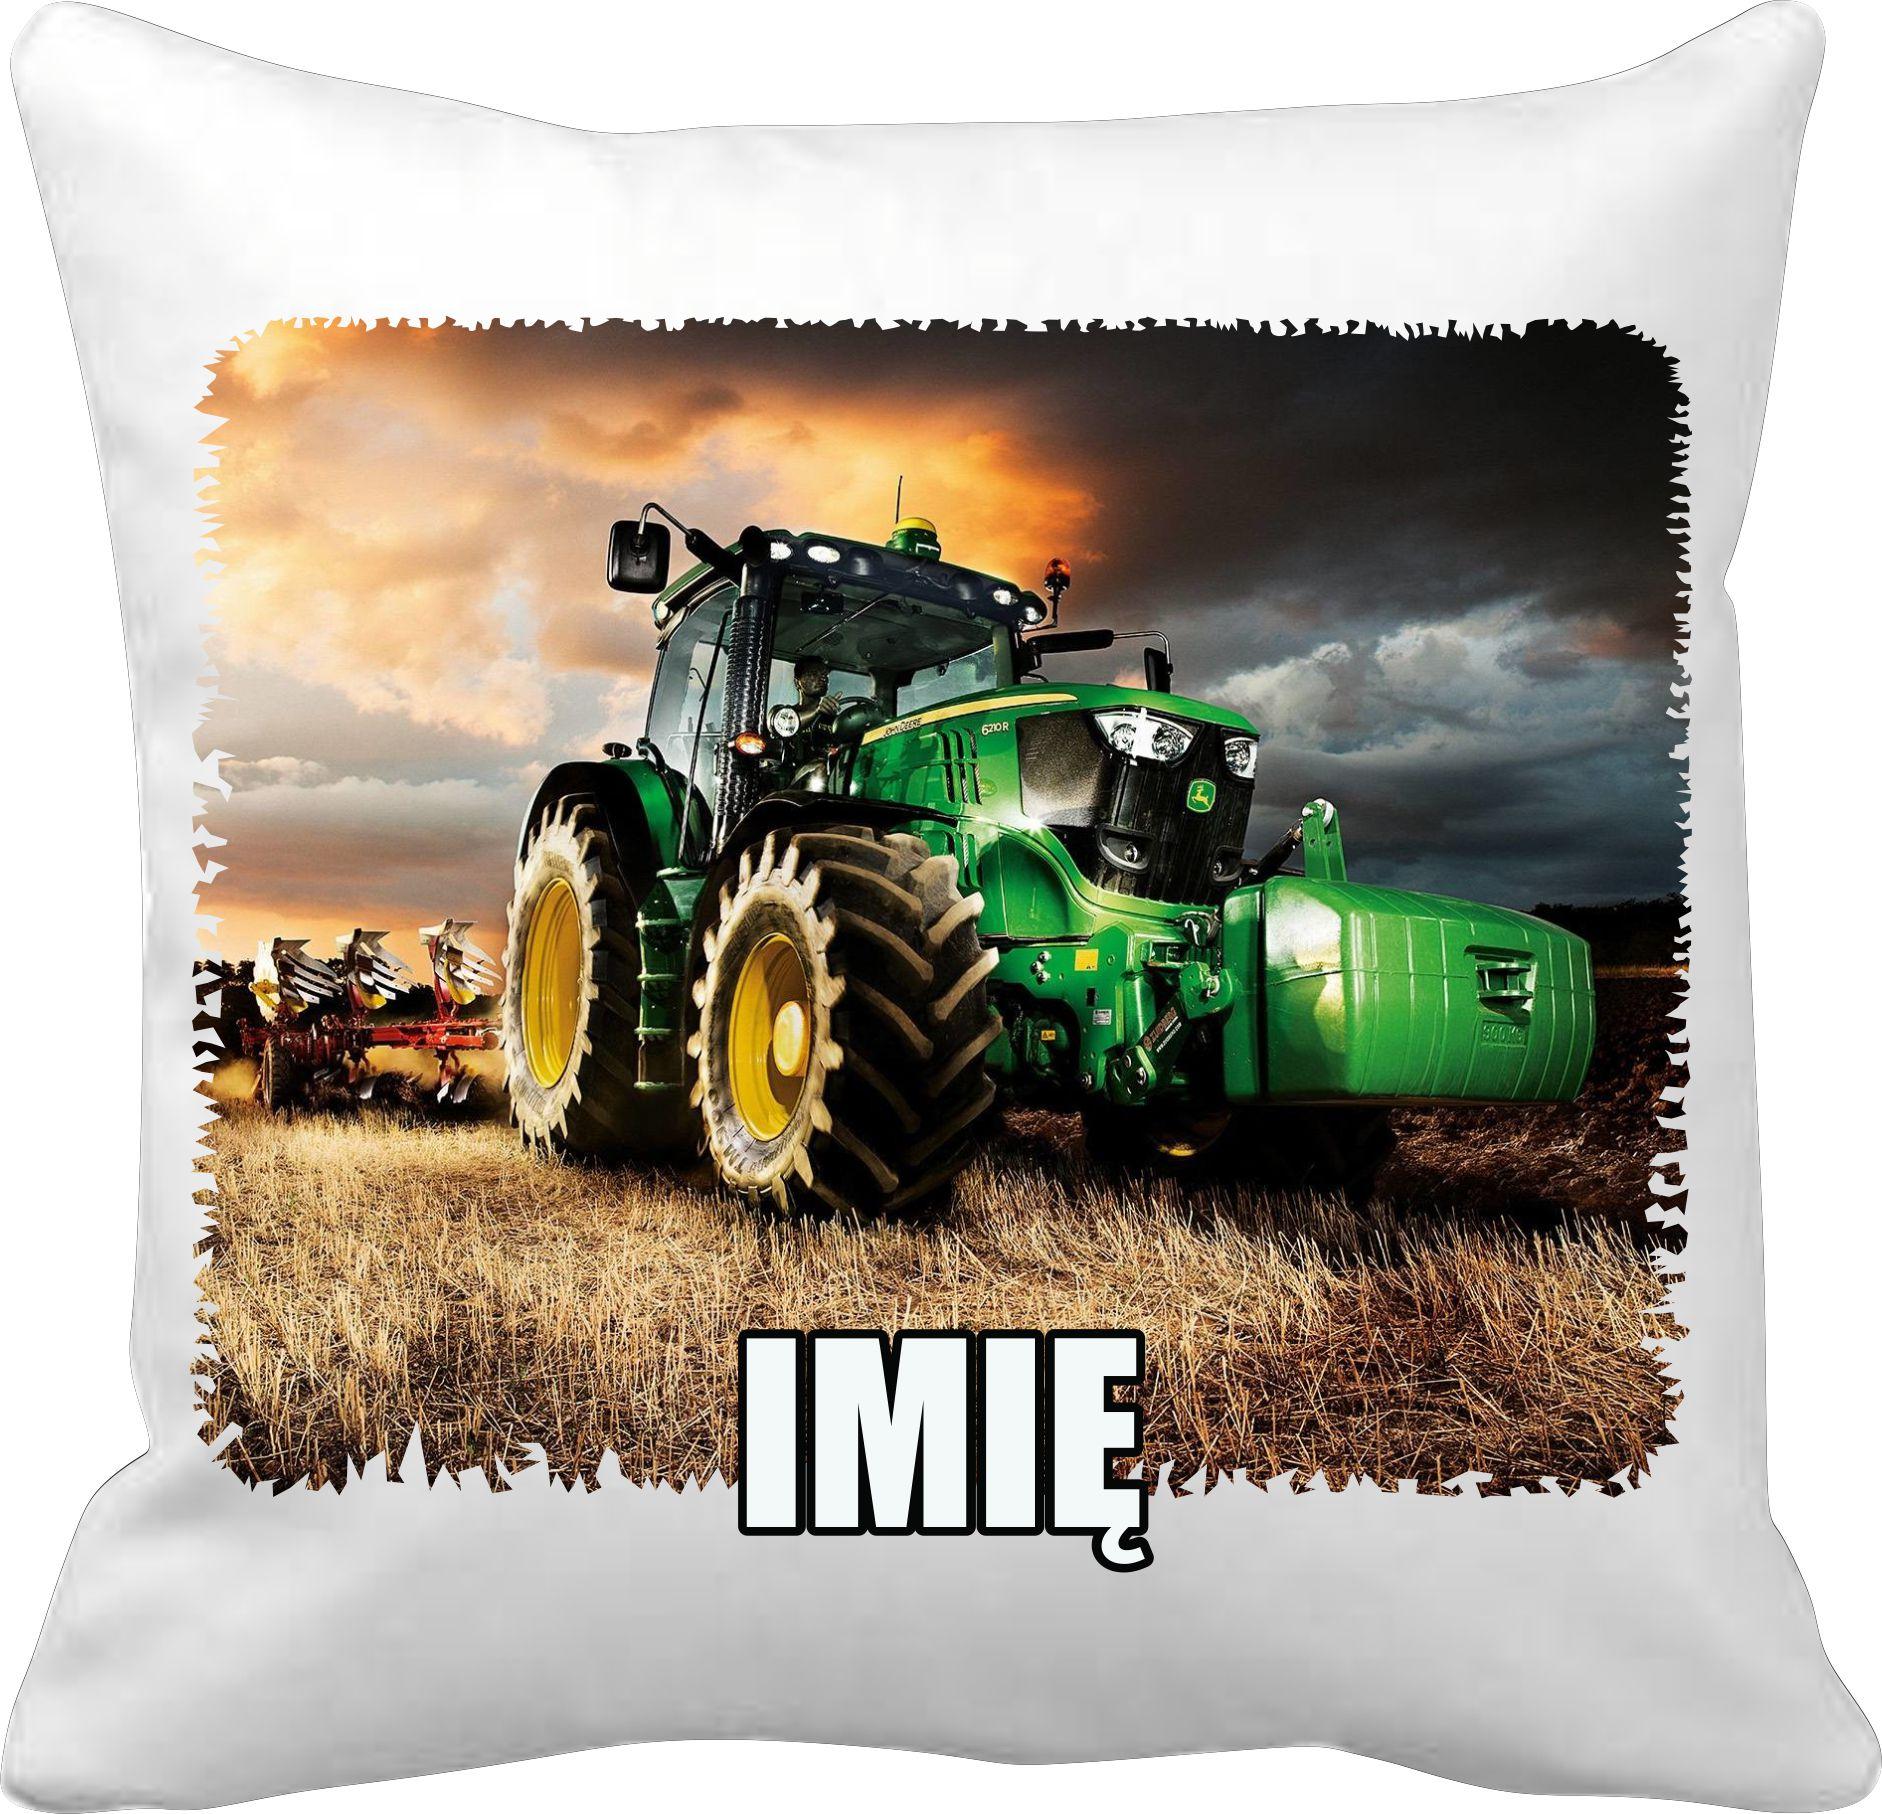 НАВОЛОЧКА ТРАКТОРЫ John Deere New Holland сельское хозяйство